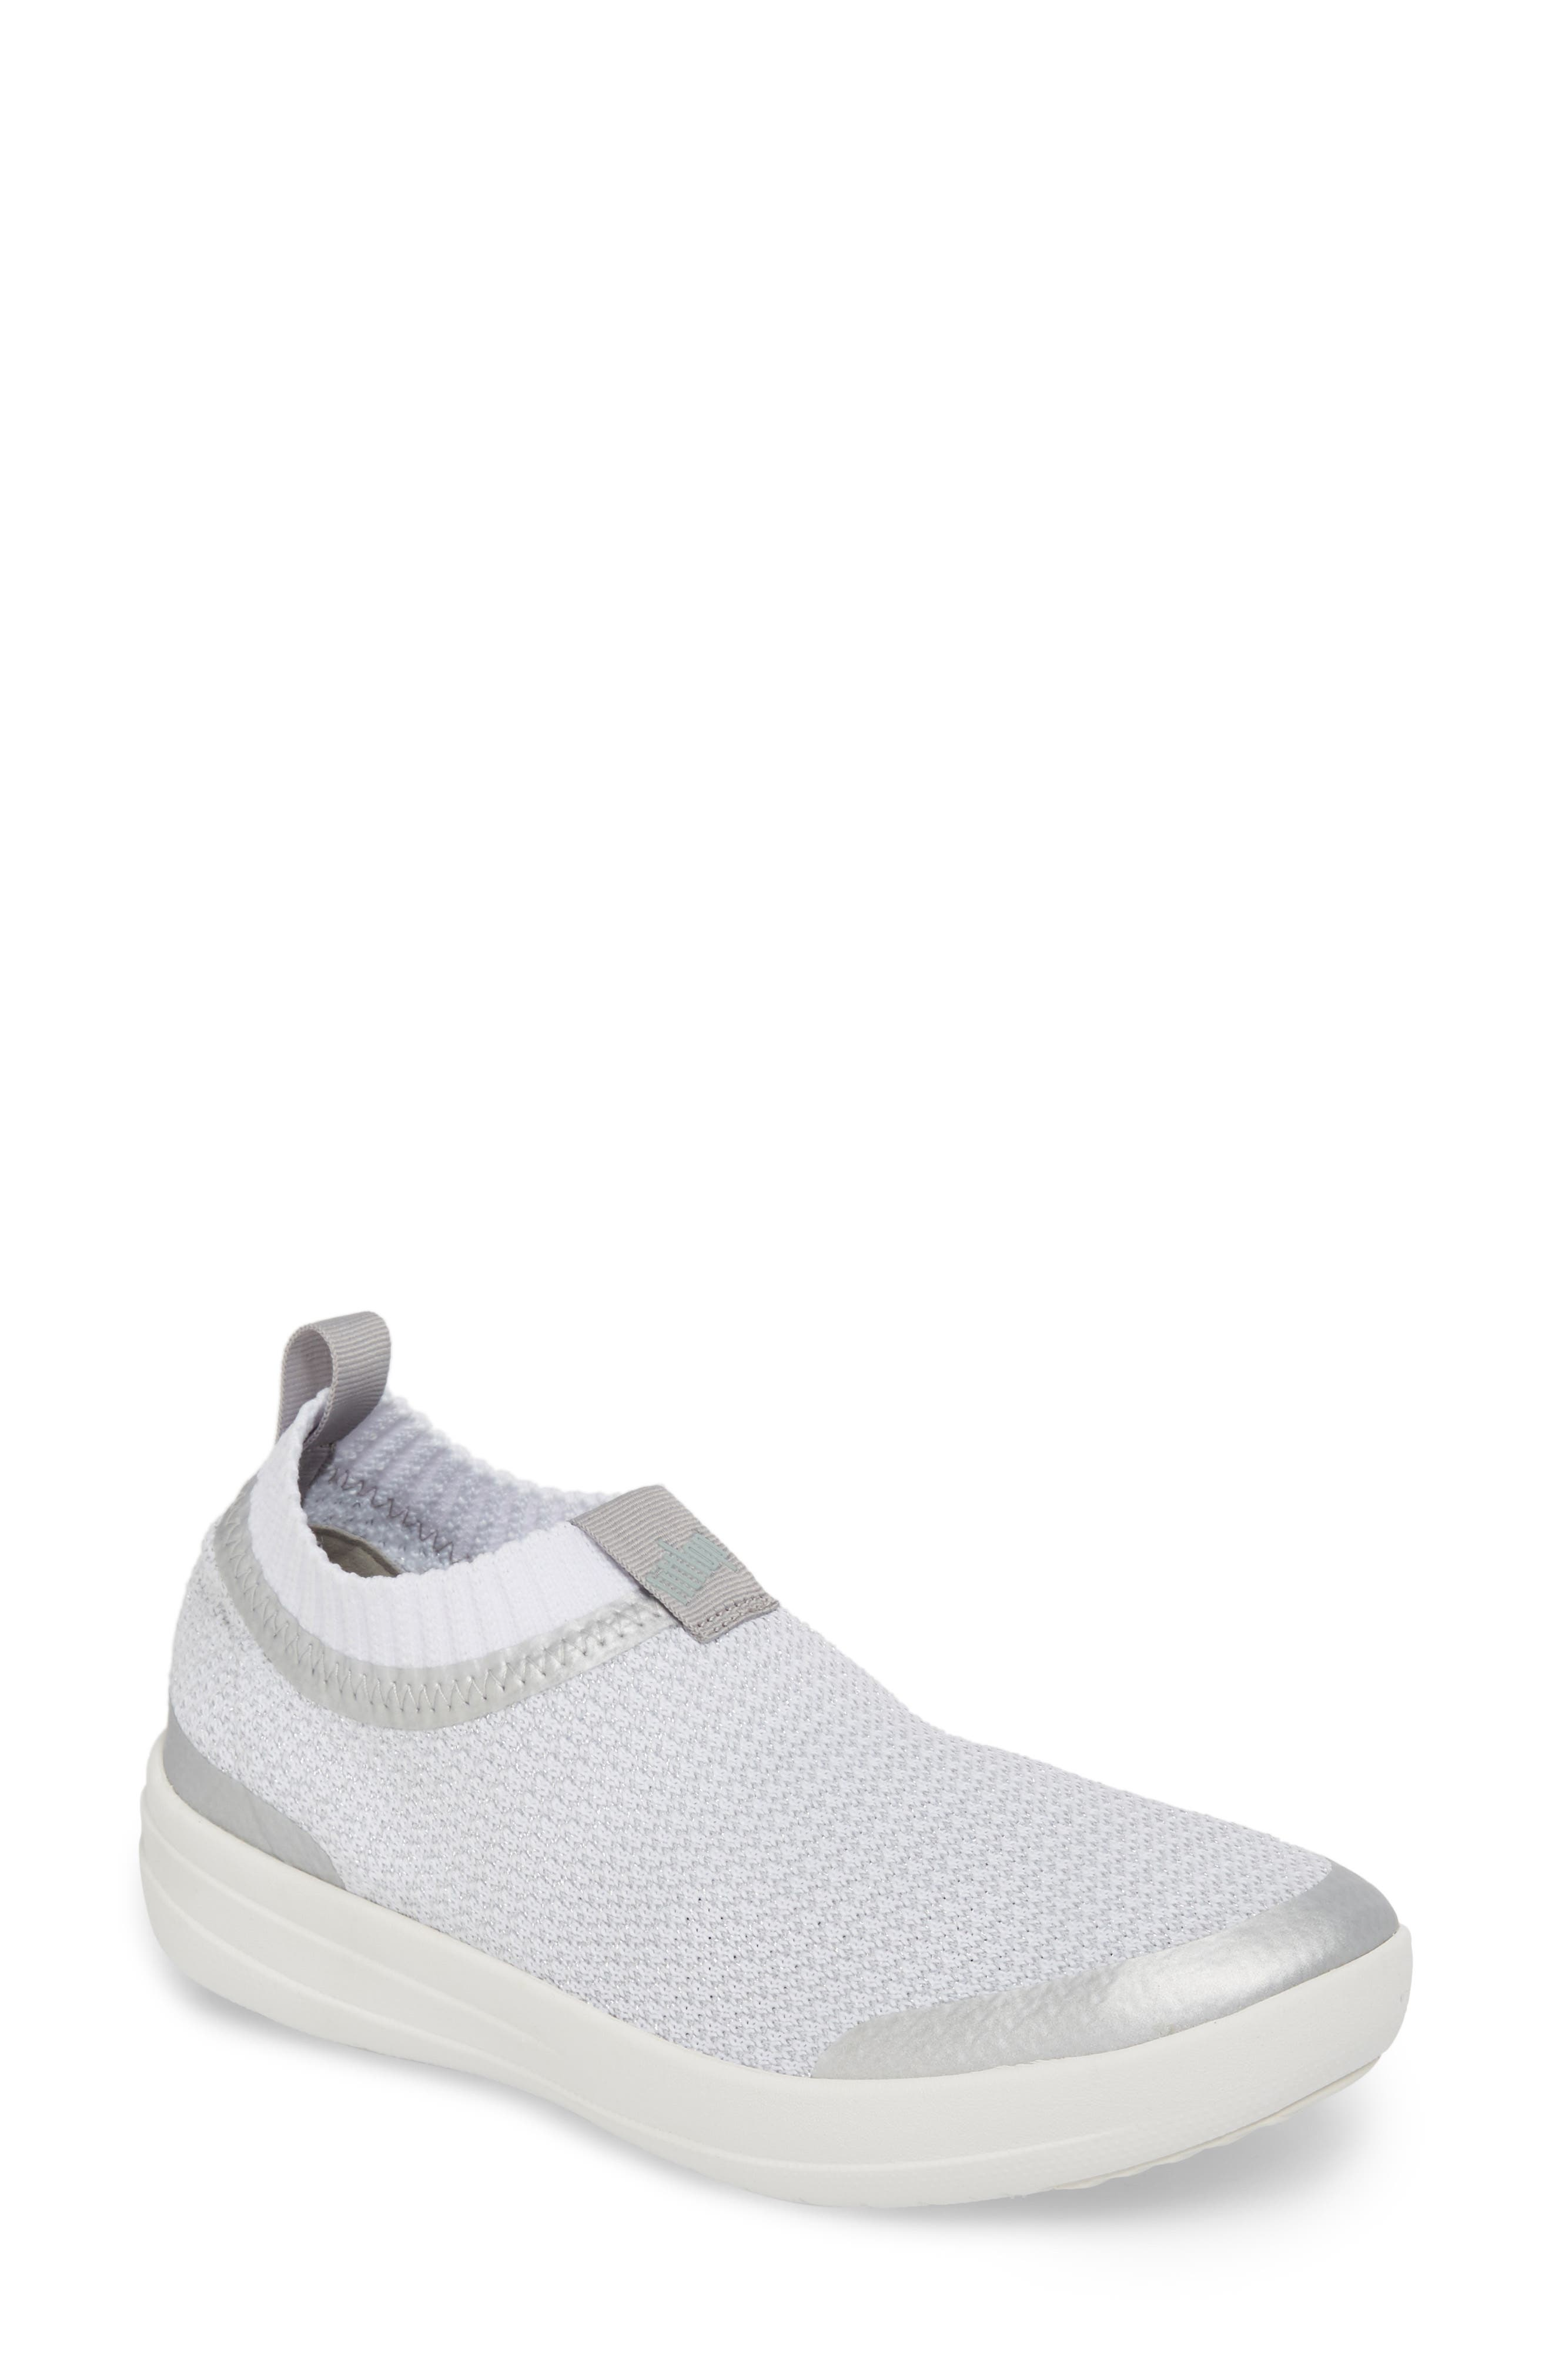 Uberknit Knit Sock Sneaker,                             Main thumbnail 1, color,                             040